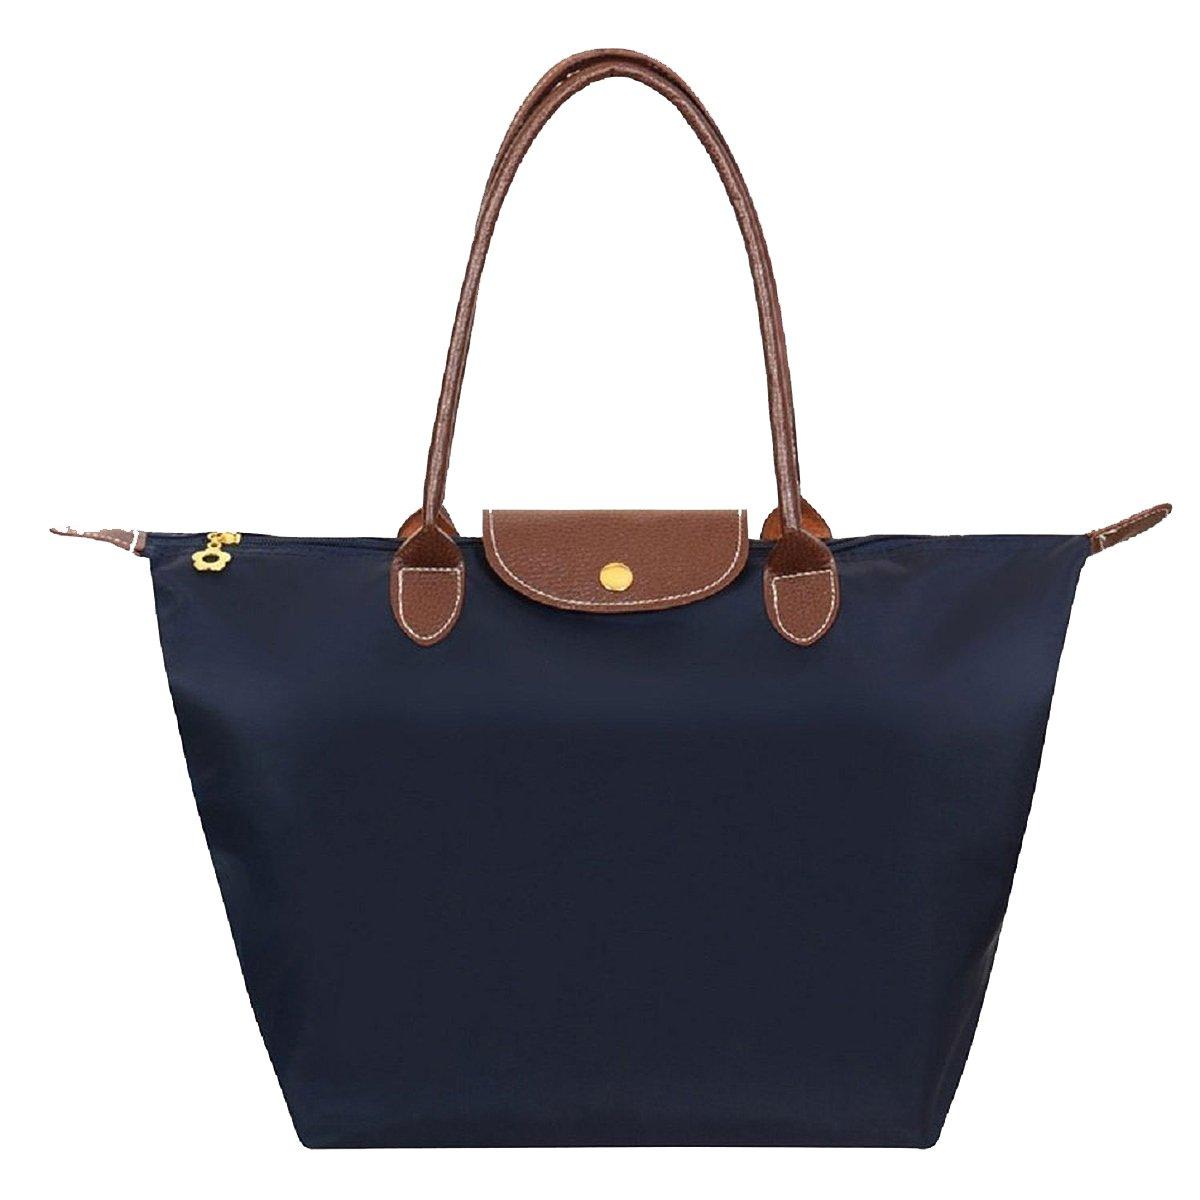 9df54a0efee ZhengYue Women s Stylish Waterproof Zipper Tote Bag Handbag Nylon Travel  Shoulder Beach Messenger Bags Ladies Shopping Fold Bag Casual Bags Fold Bag  – ...